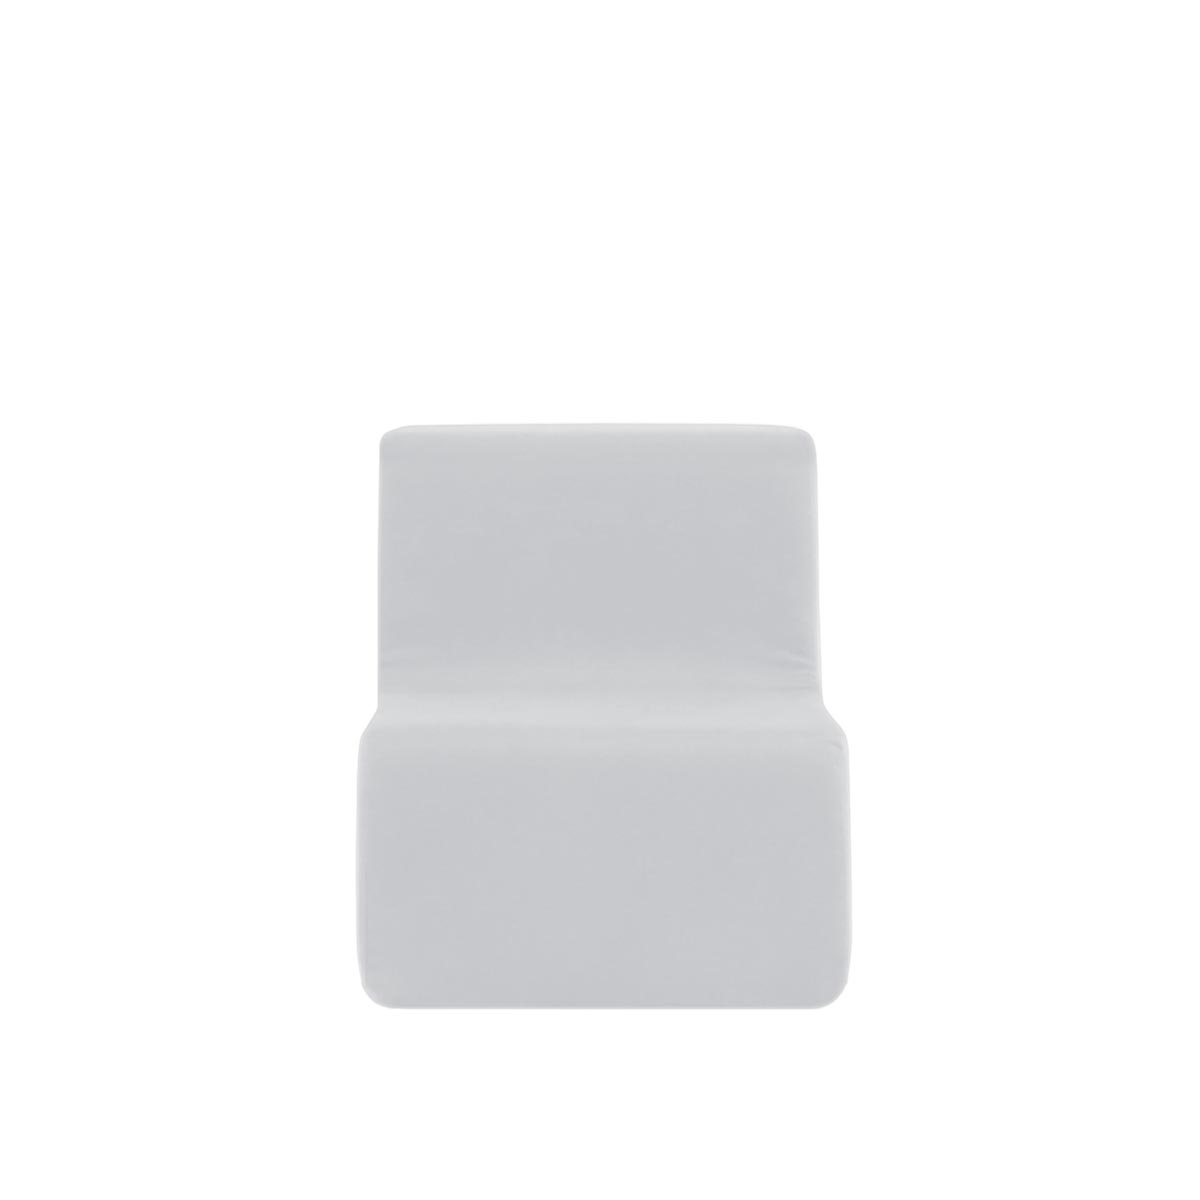 Poltroninha Muss r02 Tecido Lonita Branco 01